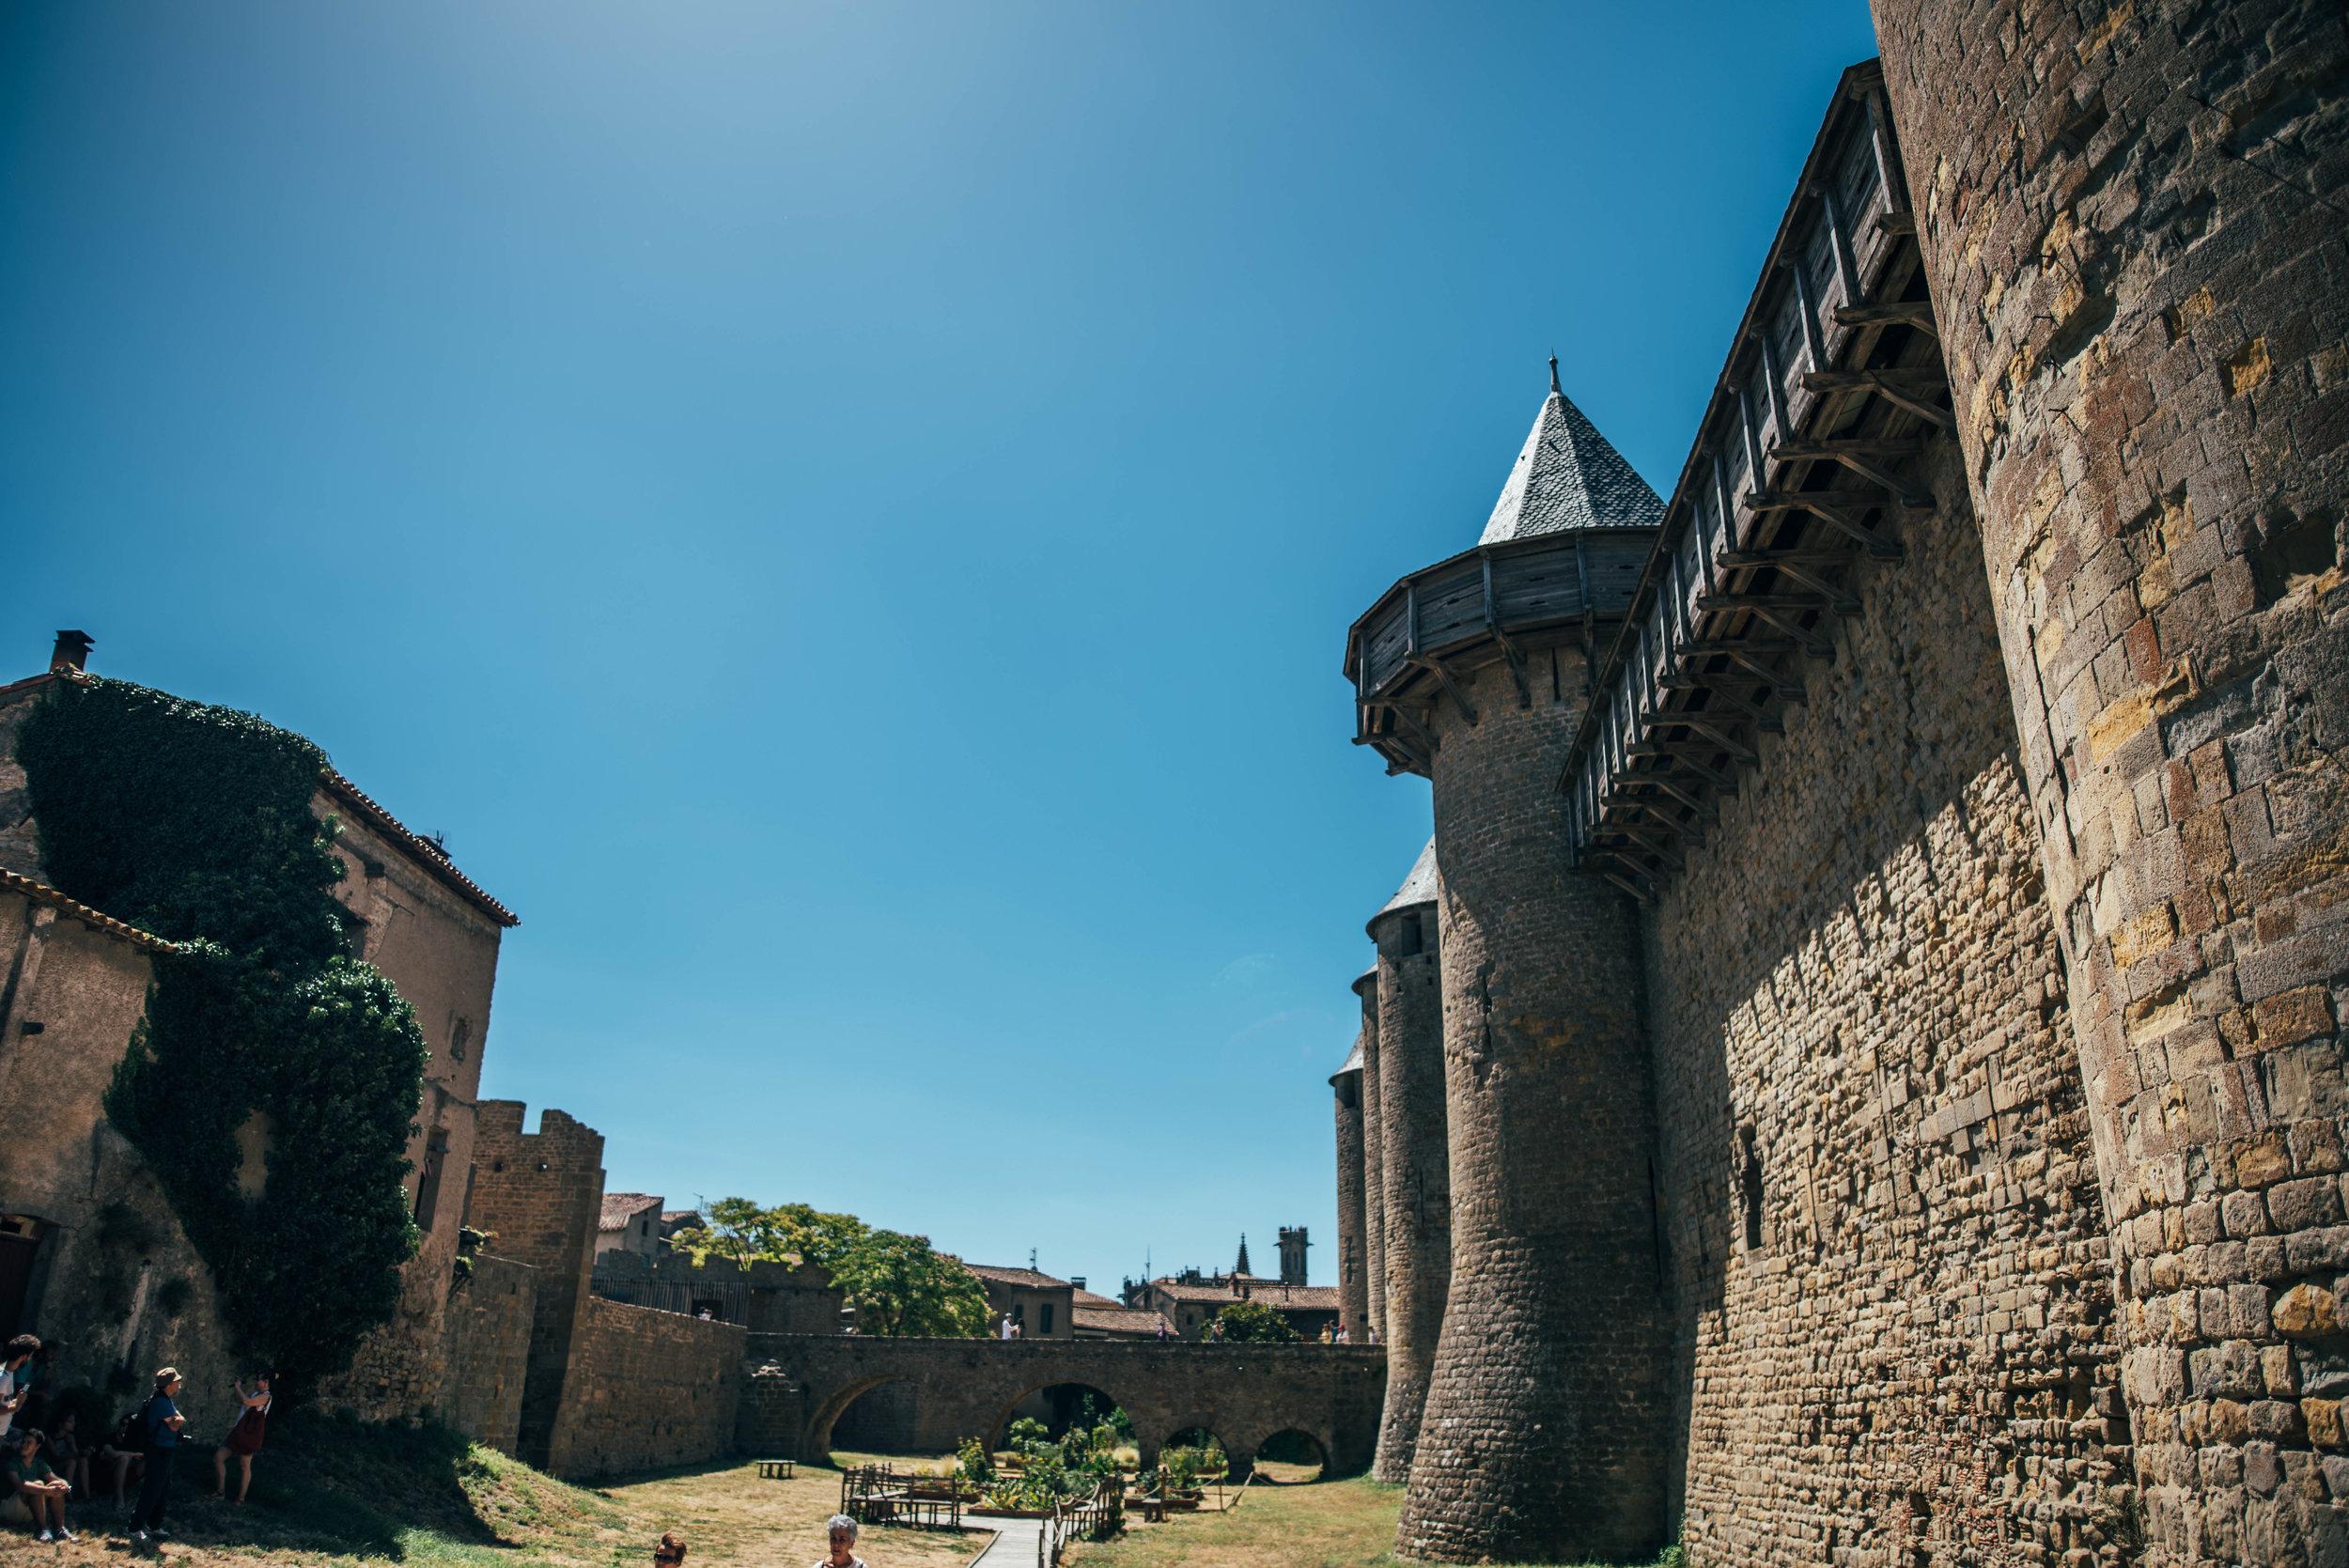 Internal walls of Citadel Carcassonne France Essex UK Documentary Photographer